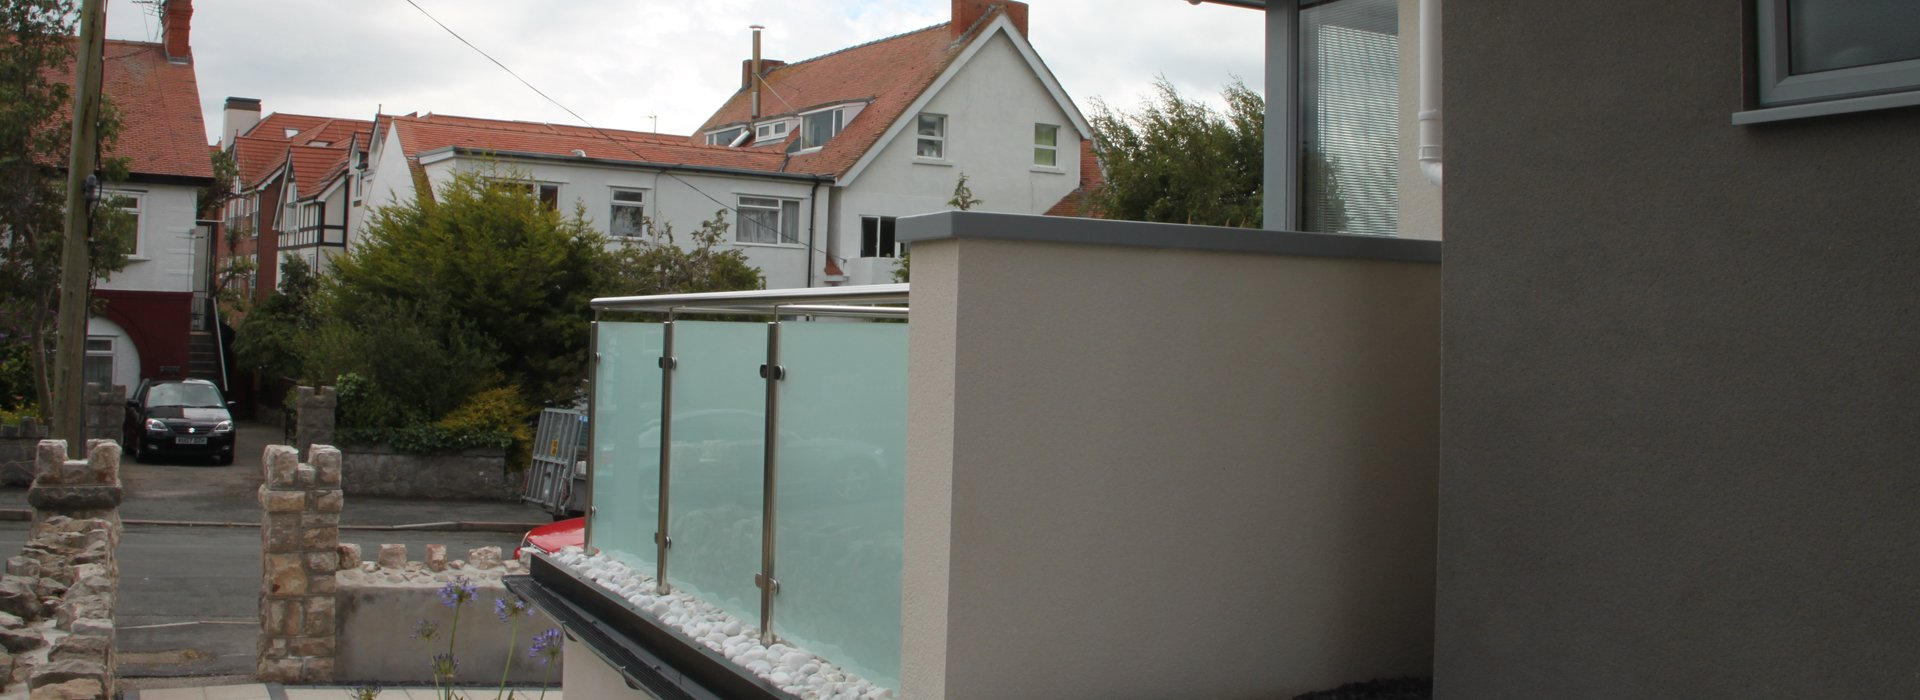 Quality glazing services